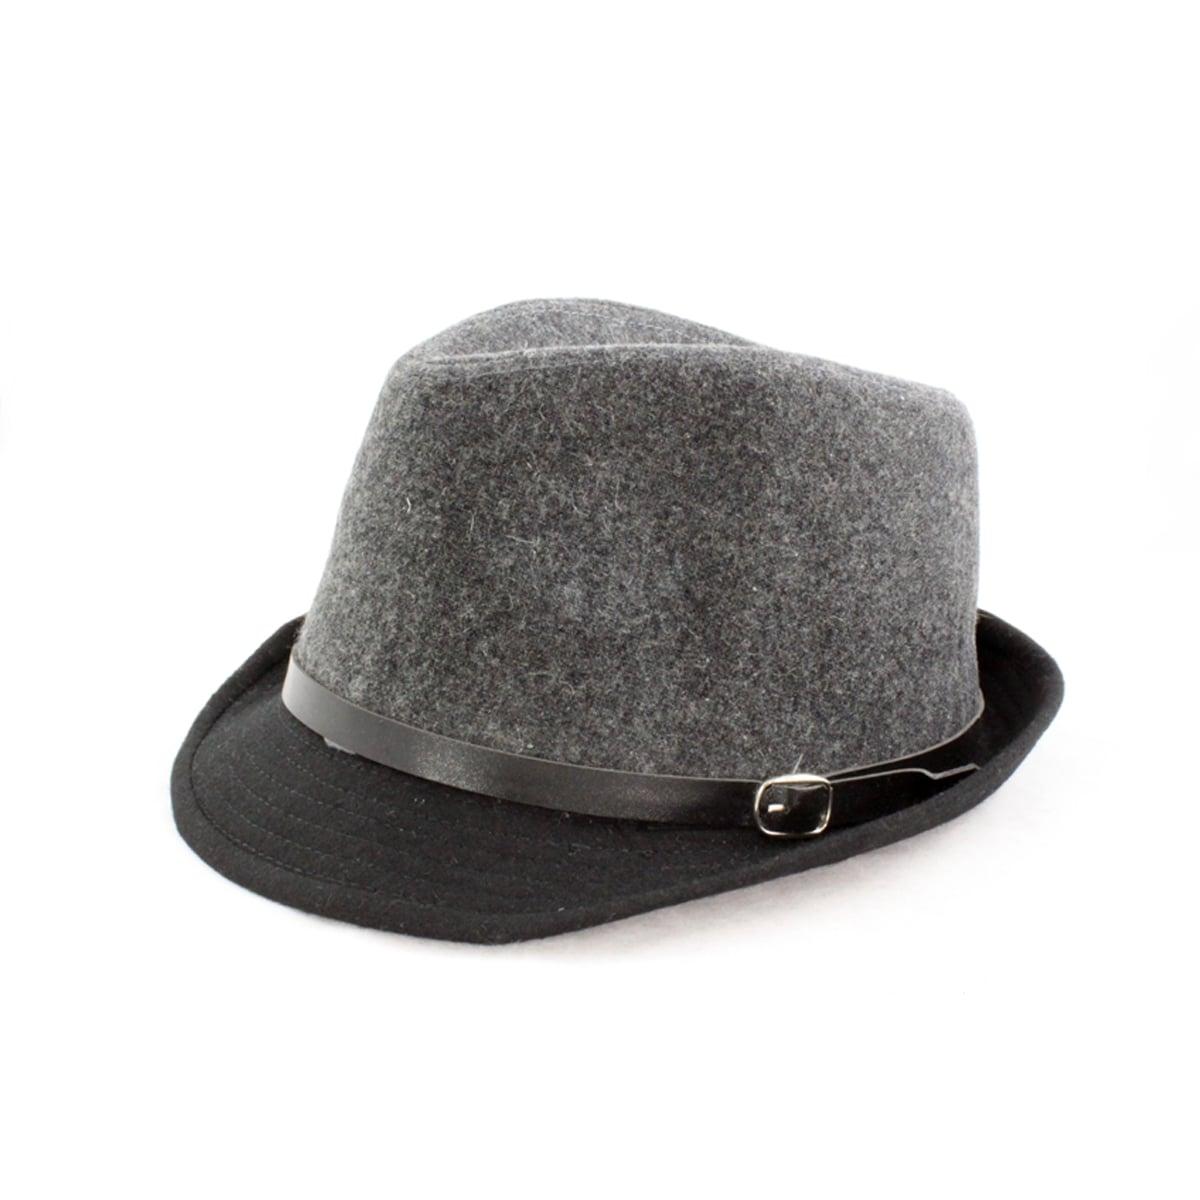 Faddism Black/ Grey Fedora Hat